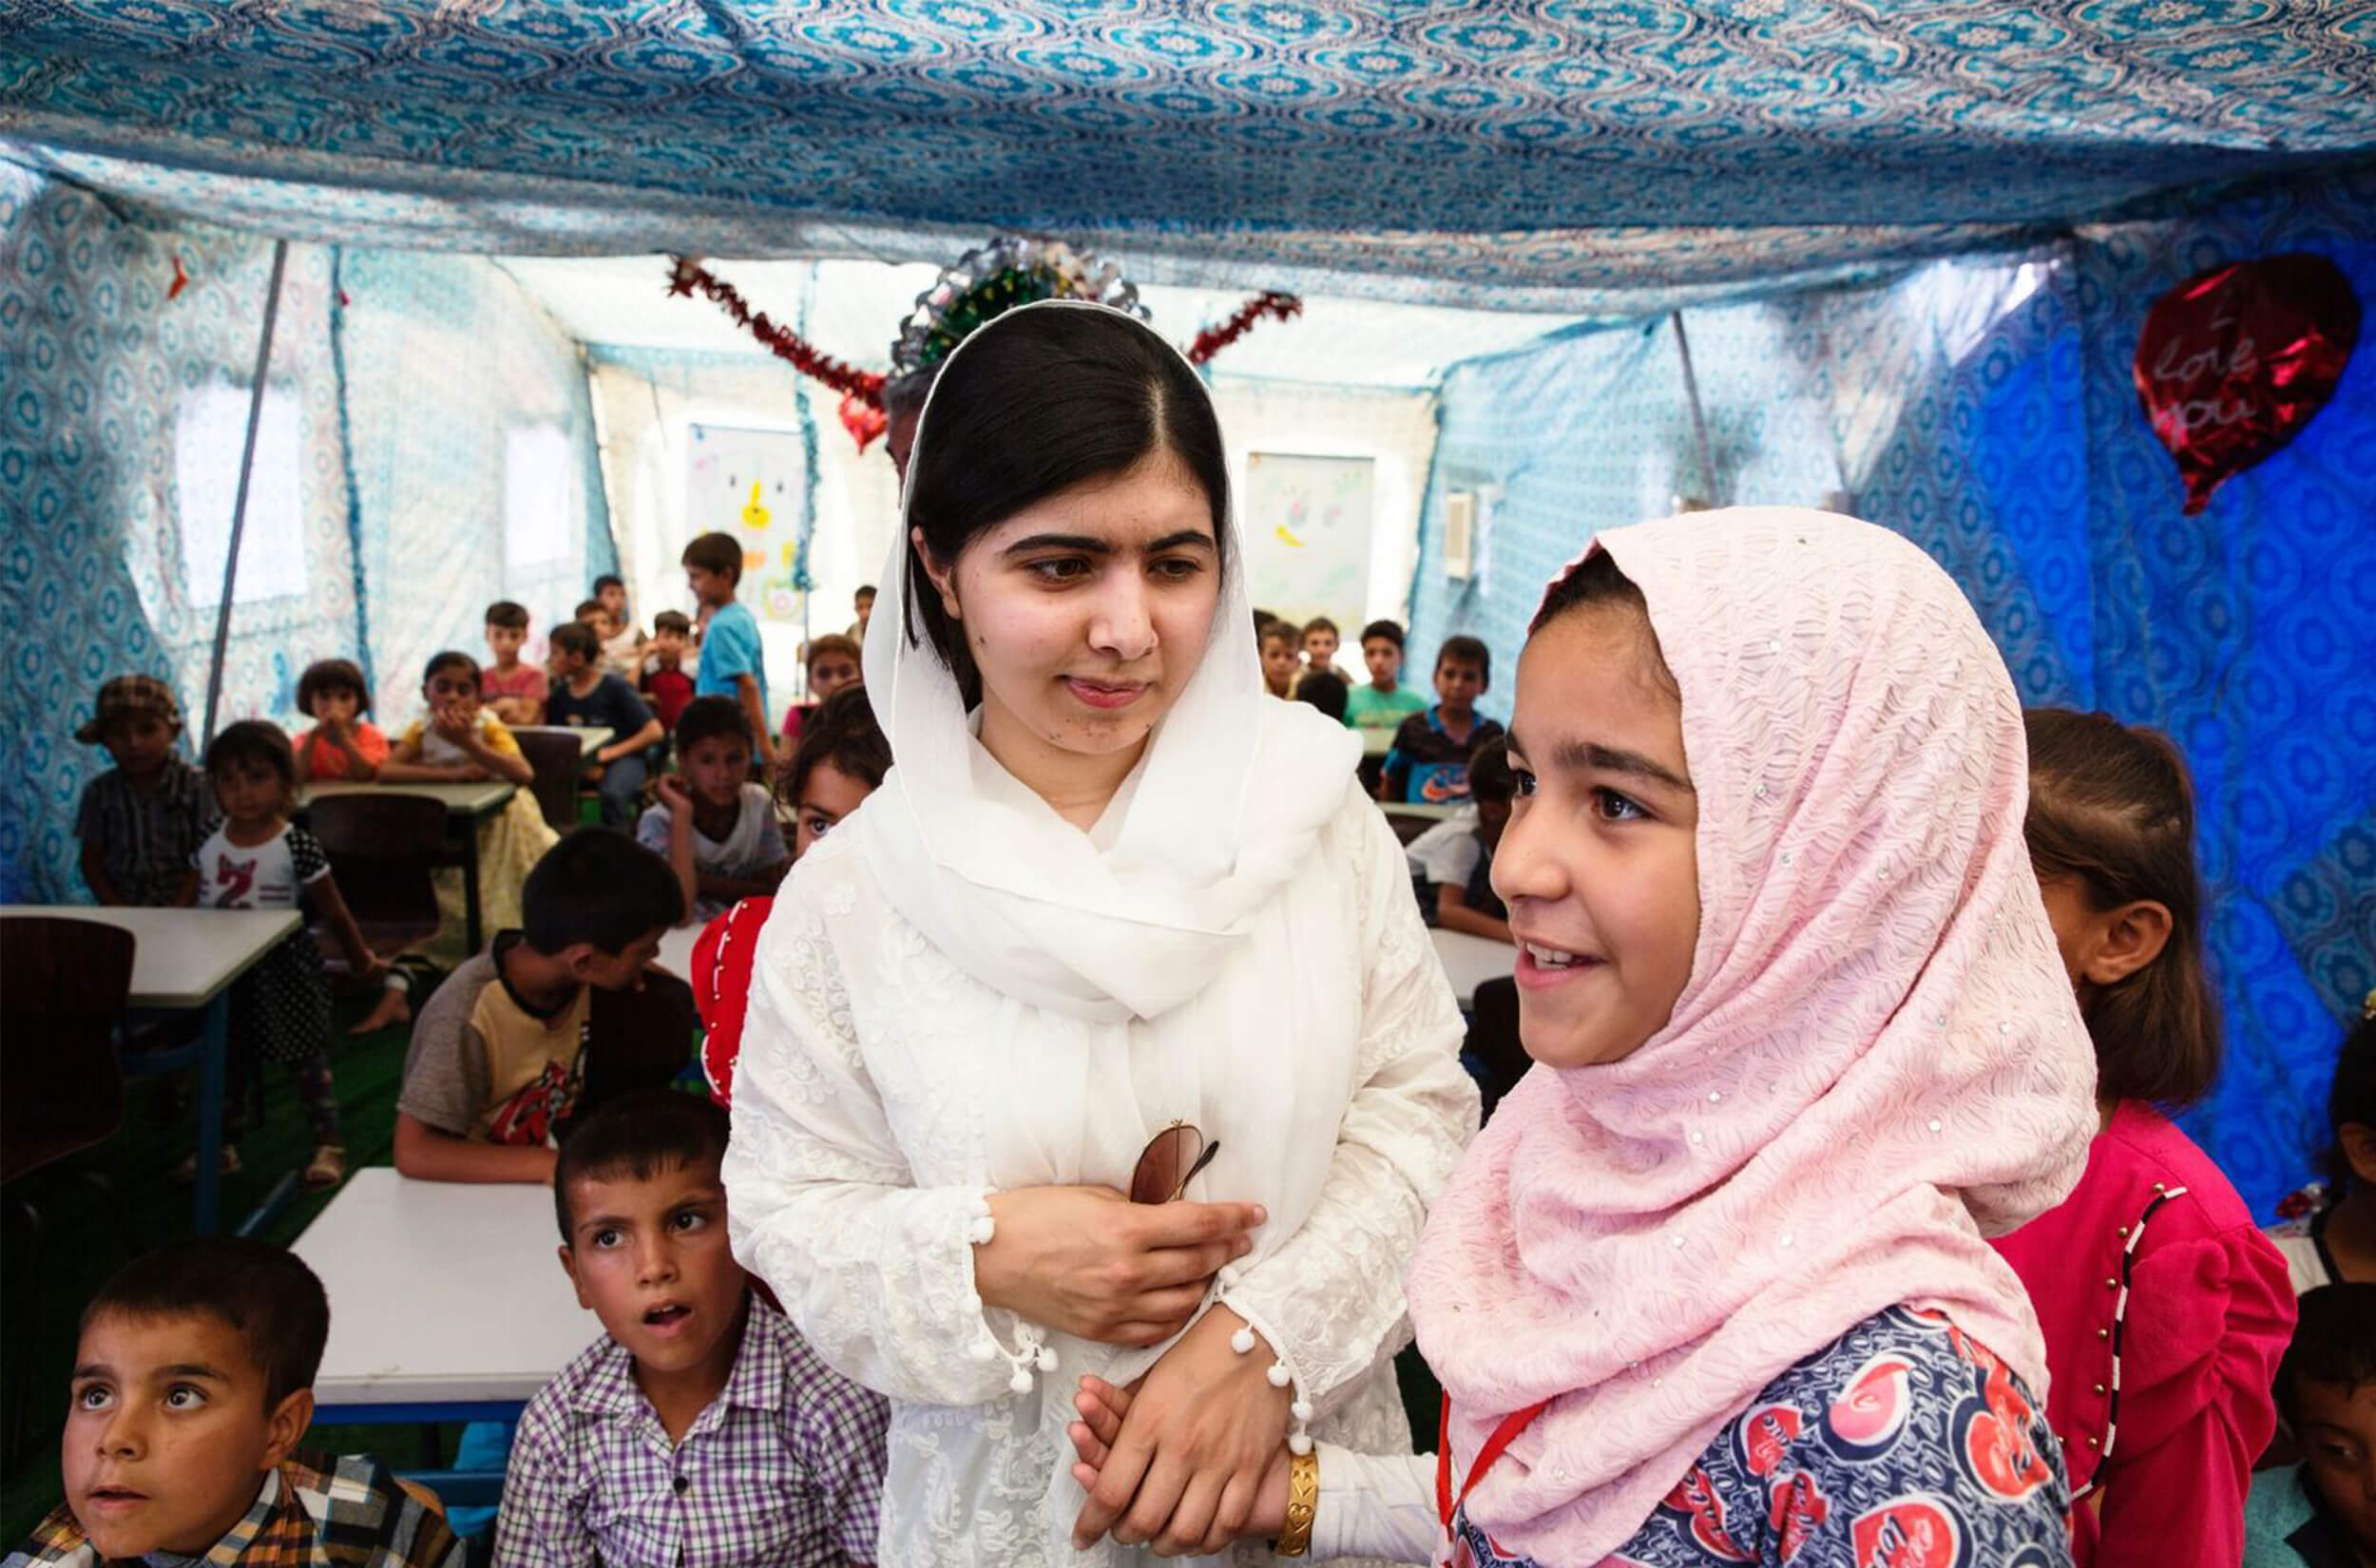 Malala Yousafzai in a classroom full of kids